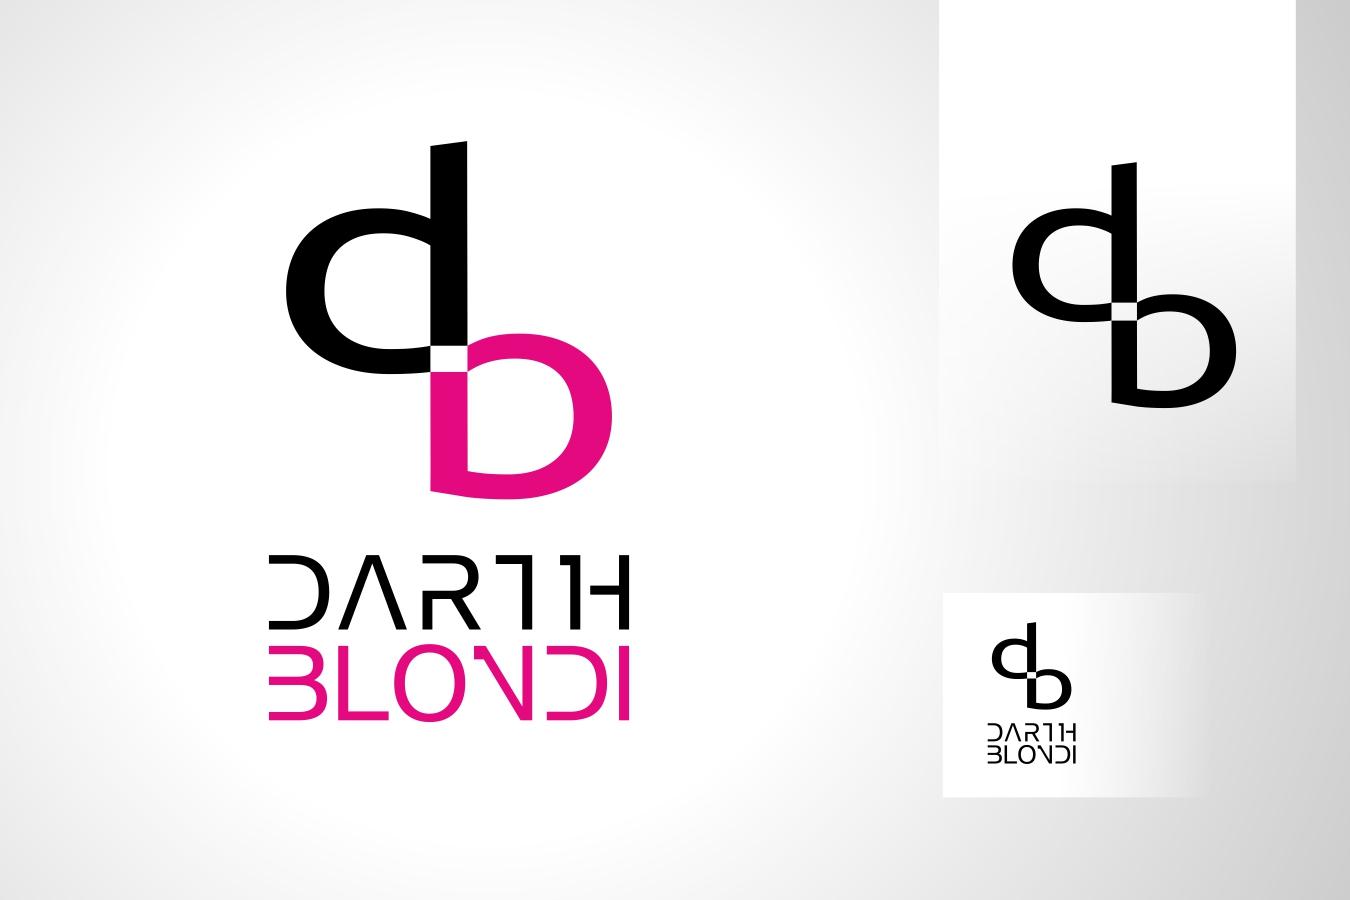 design_branding_Darth_Blondi